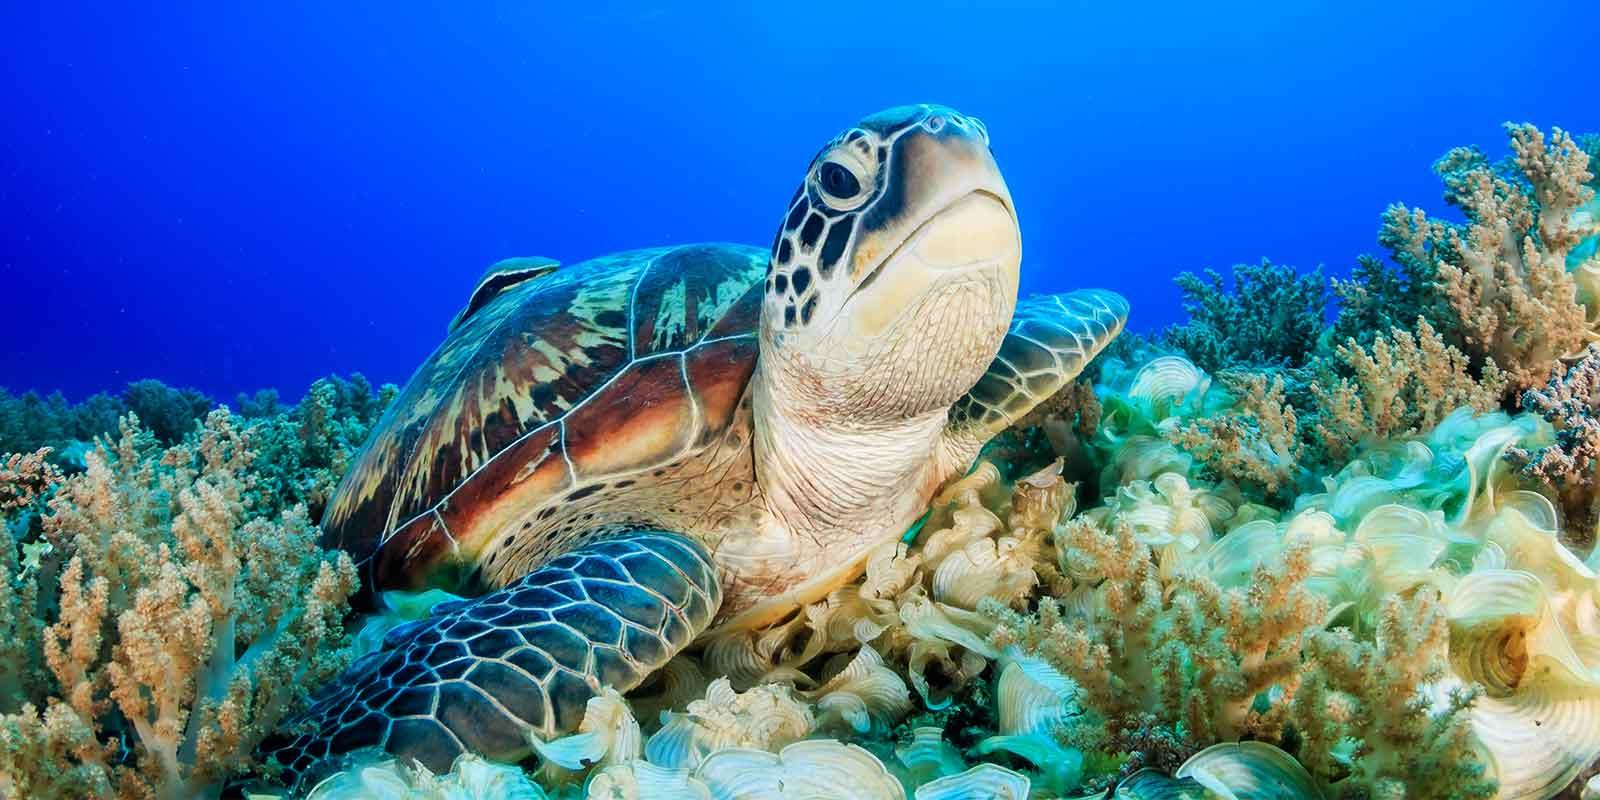 Sea turtle amongst coral in deep blue sea in Borneo